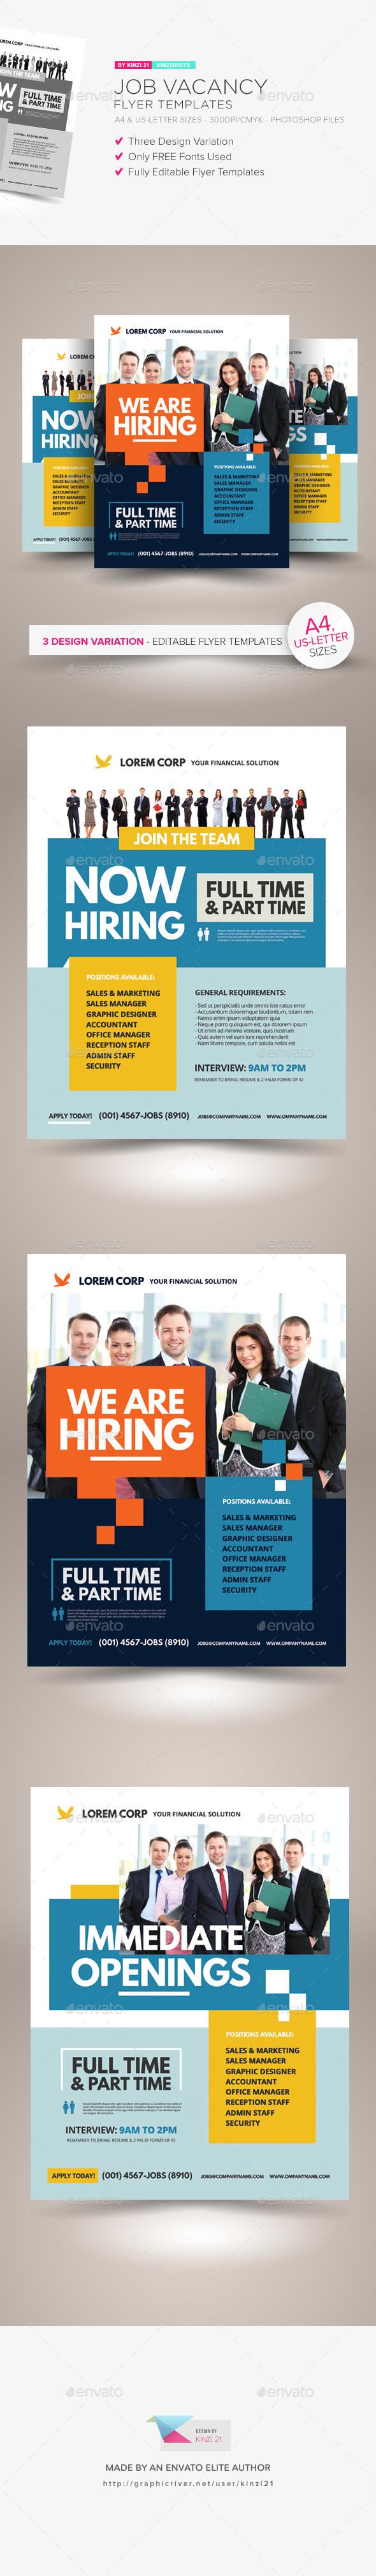 Job Vacancy Flyer Templates By Kinzishots Graphicriver